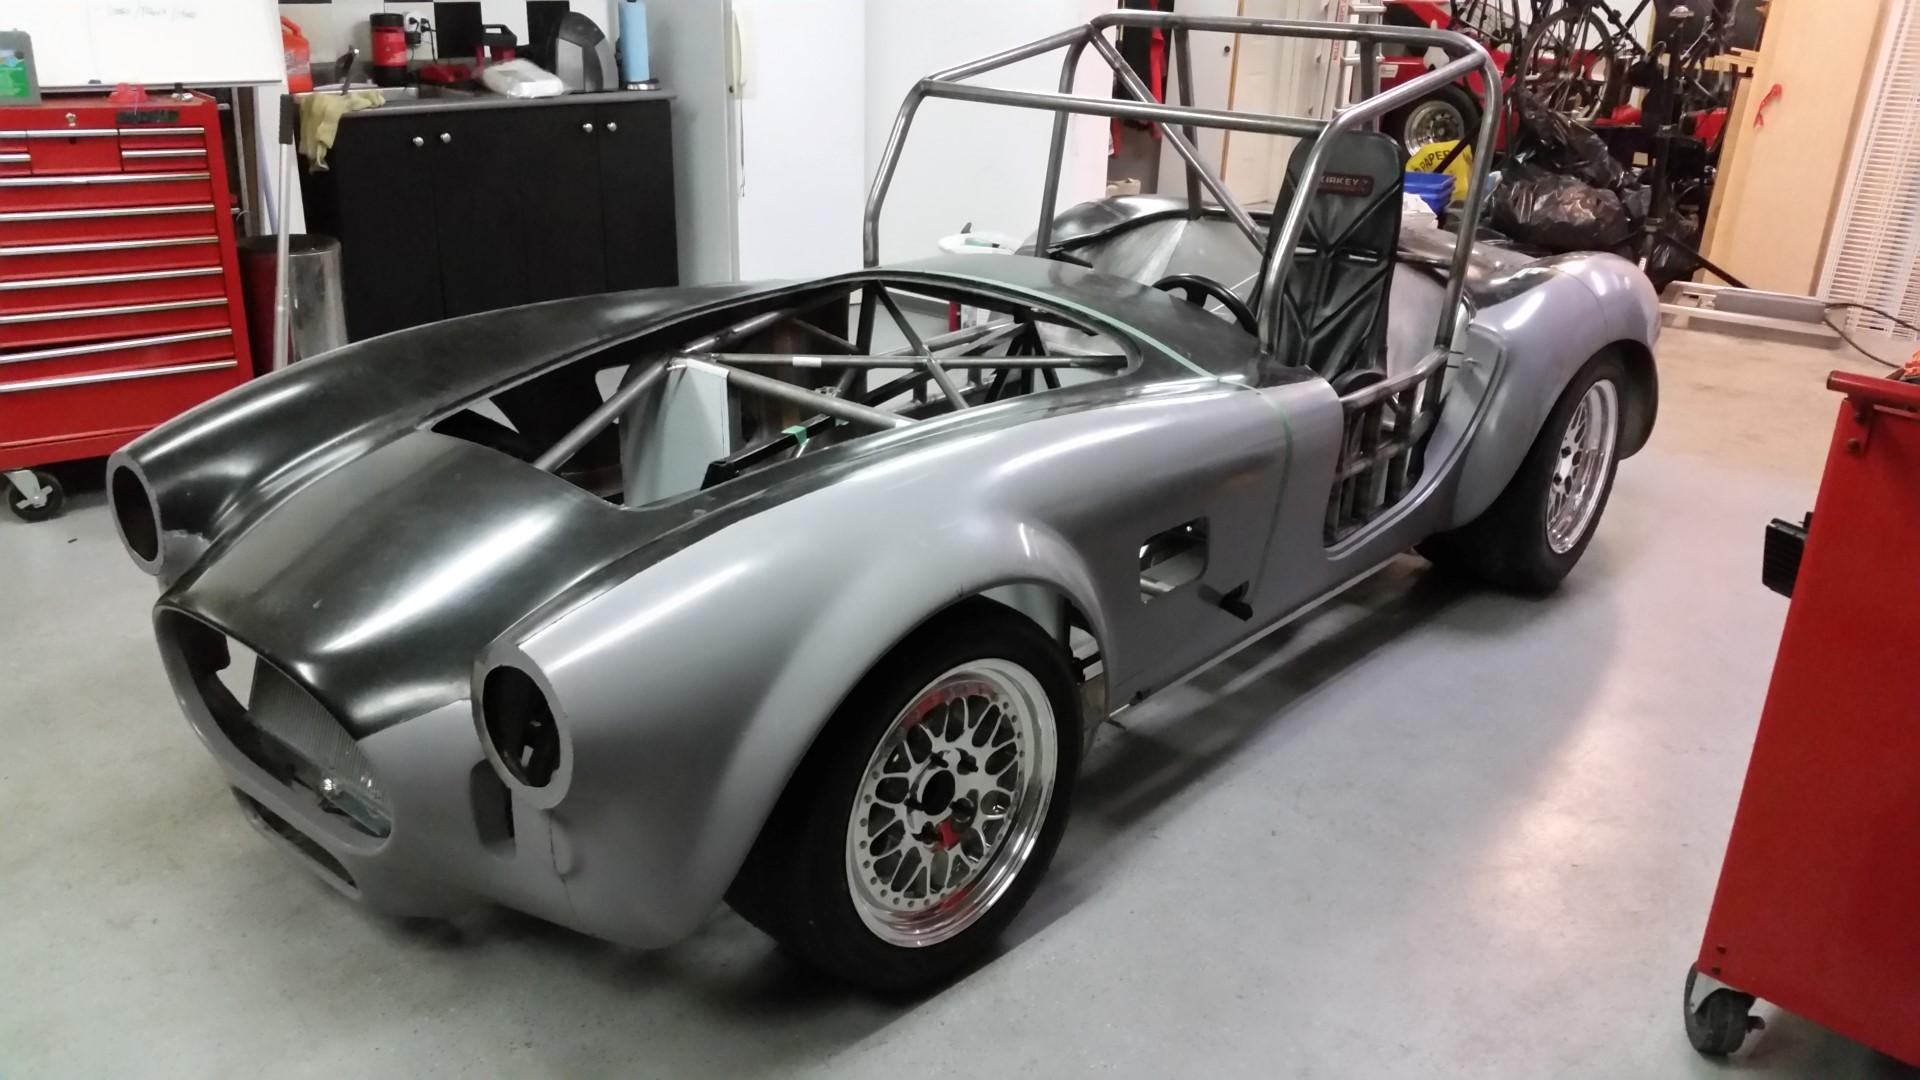 A classic 427 Shelby Cobra powered by a Tesla electric motor & Kia